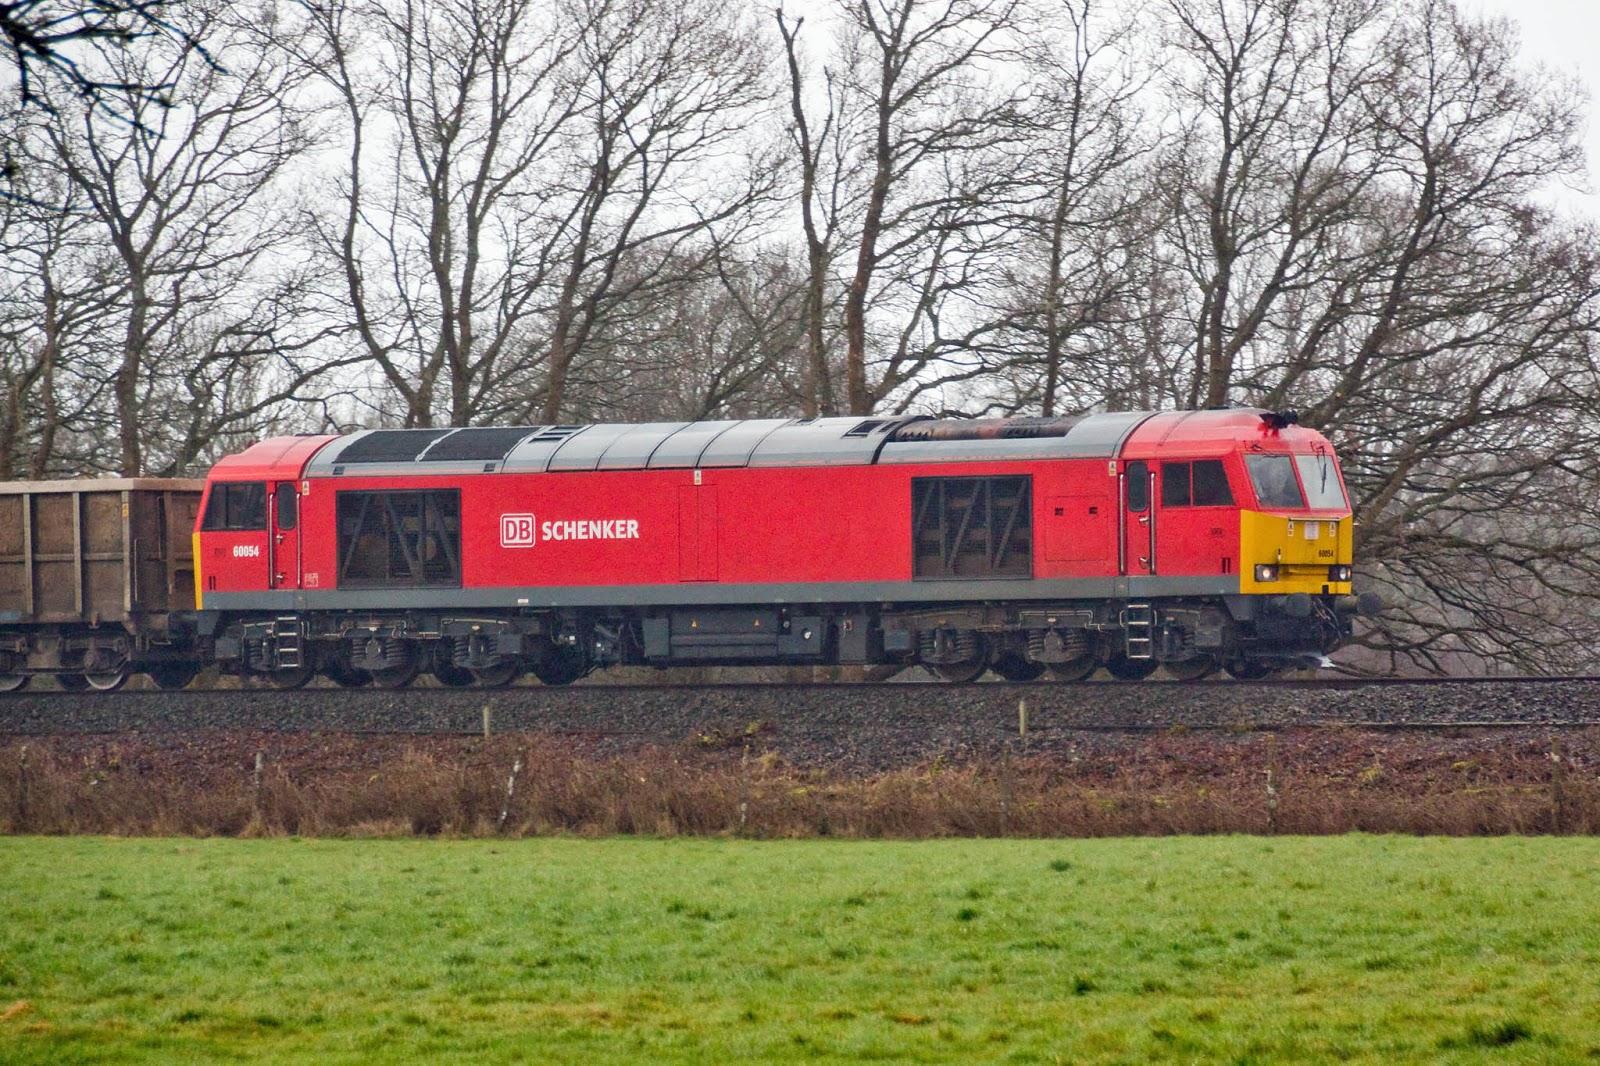 60054 7V52 13:15 Hamworthy - Whatley, seen passing Crampmoor.